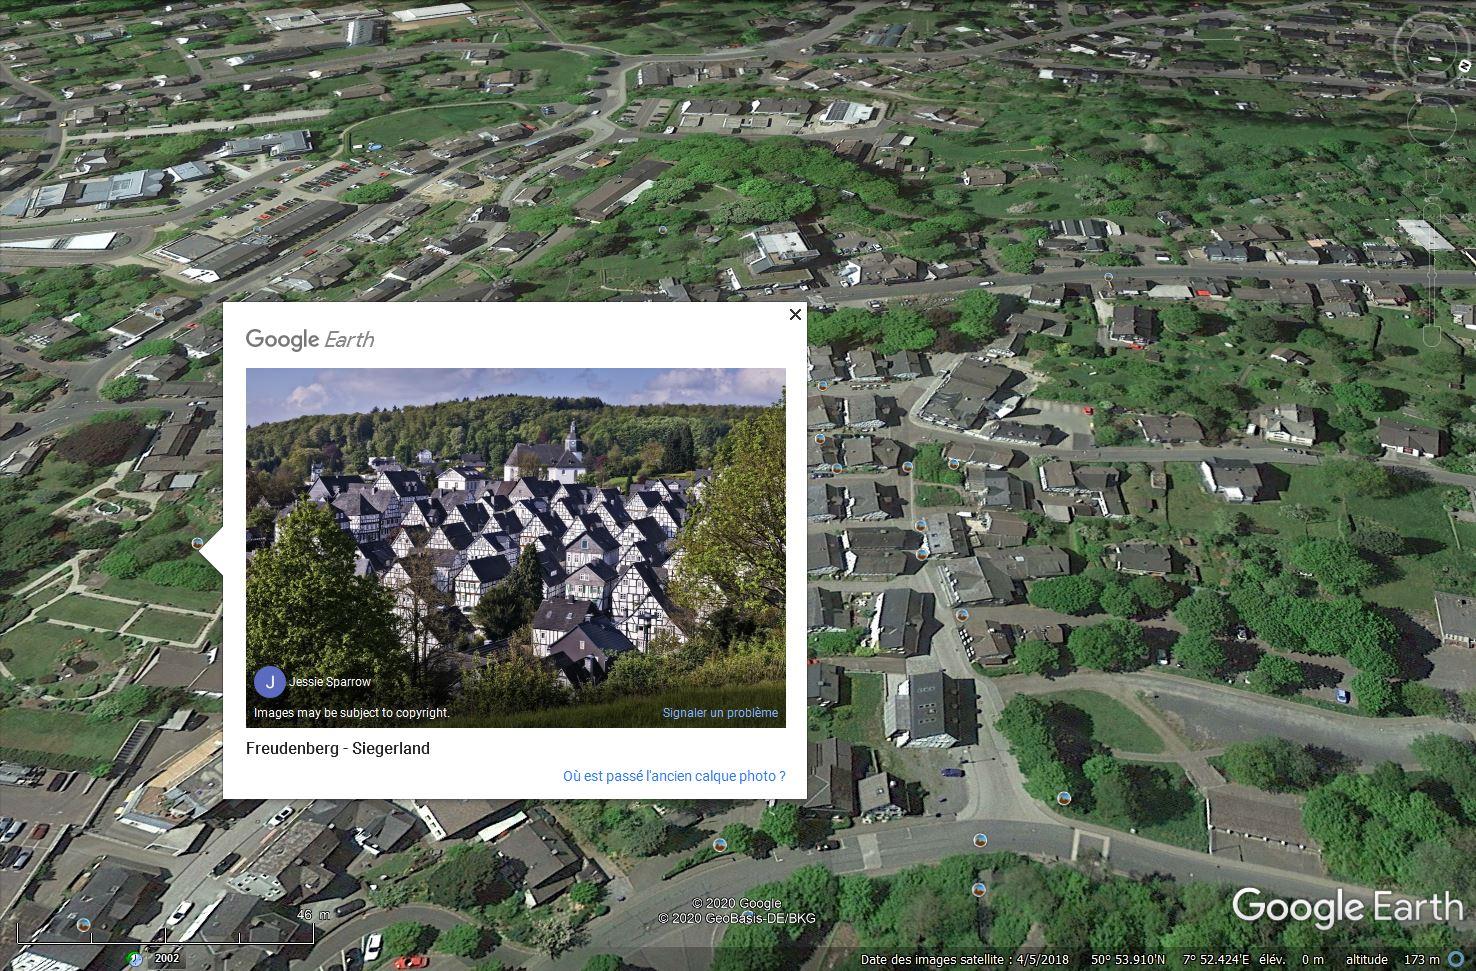 Fonds d'écran de Bing.com géolocalisés Tsge1518